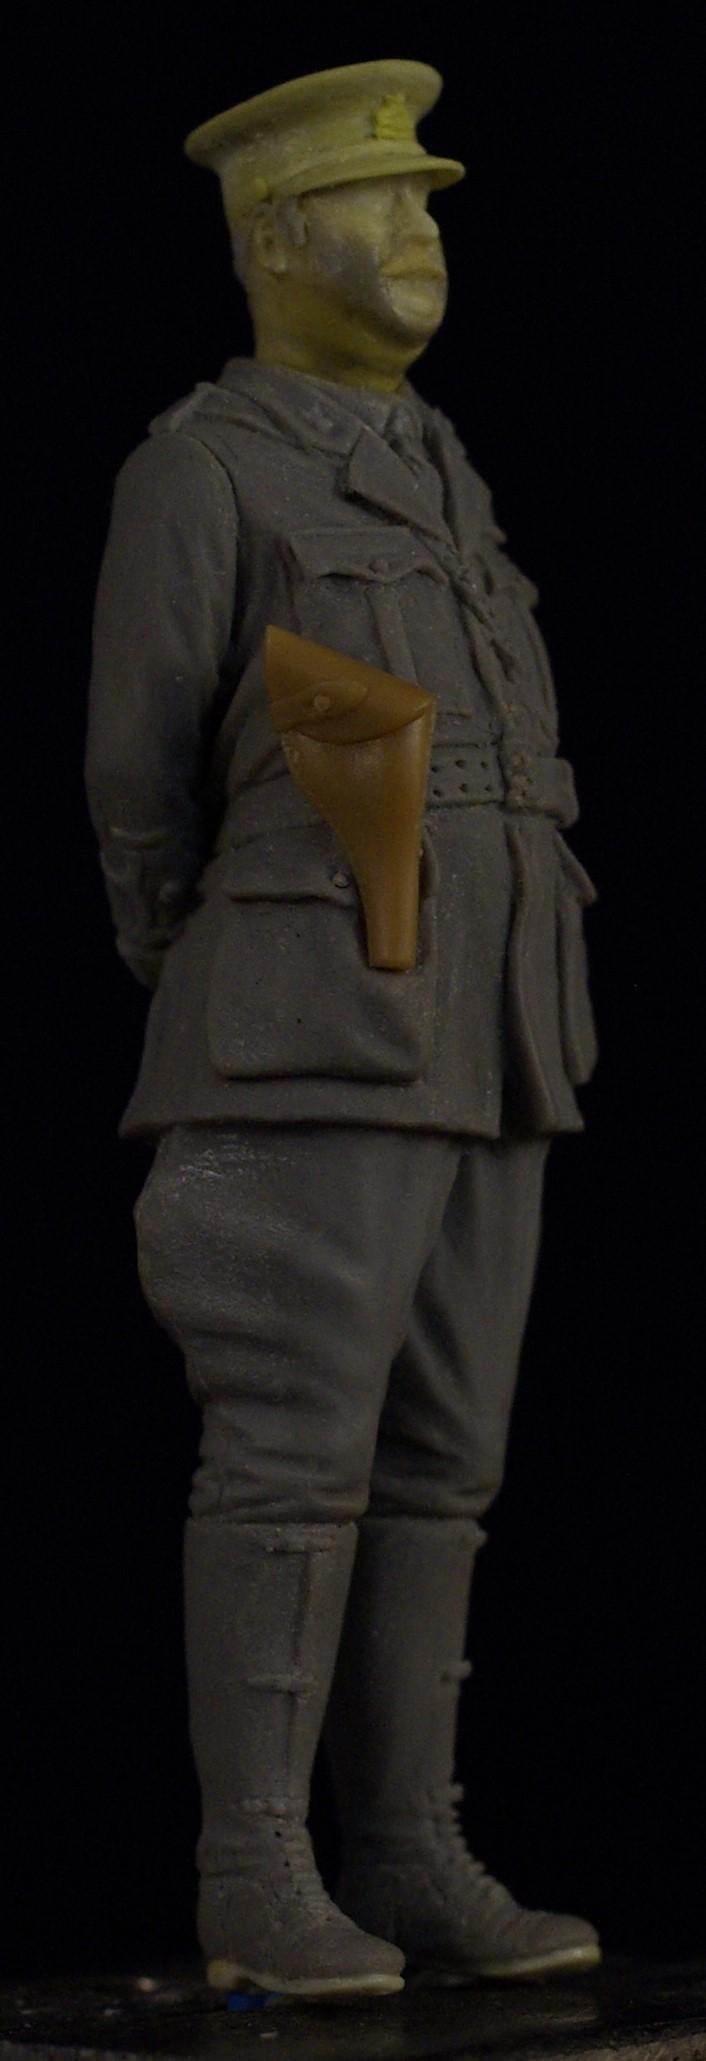 Le râleur, british officer WW1 - Page 2 _igp9115